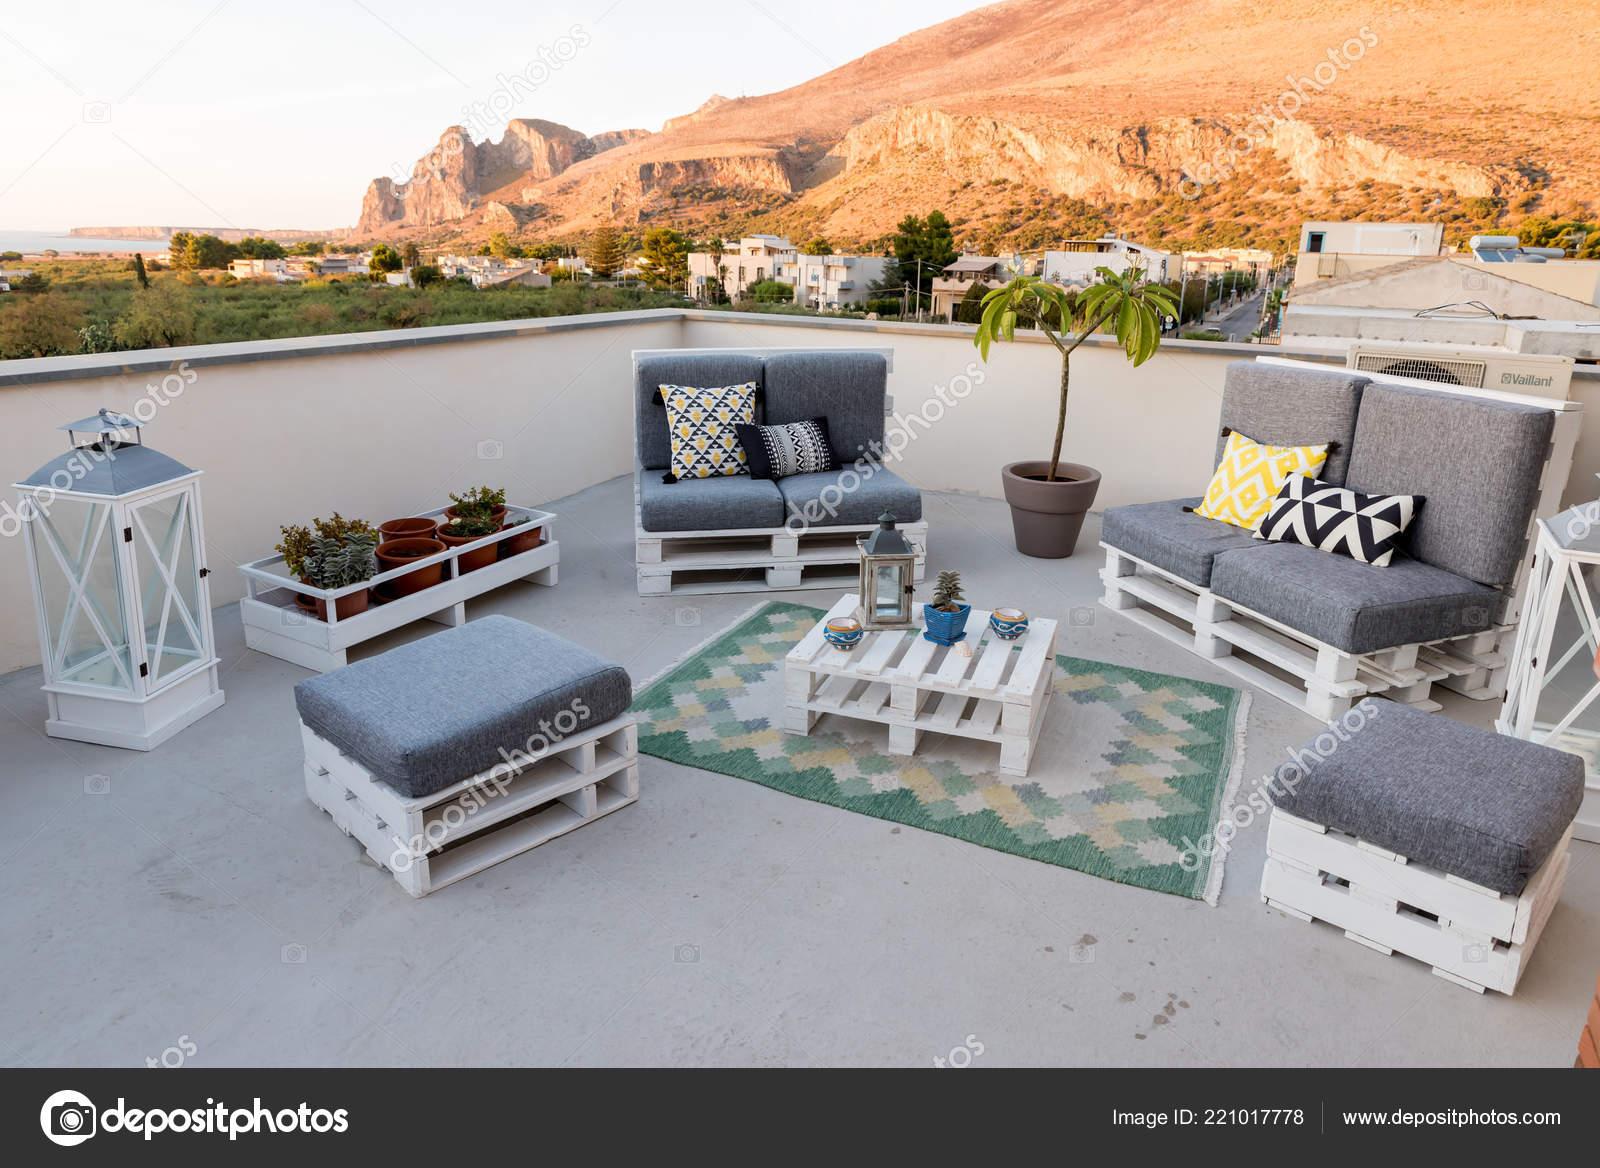 Muebles Terraza Jardín Foto De Stock Fpwing C 221017778